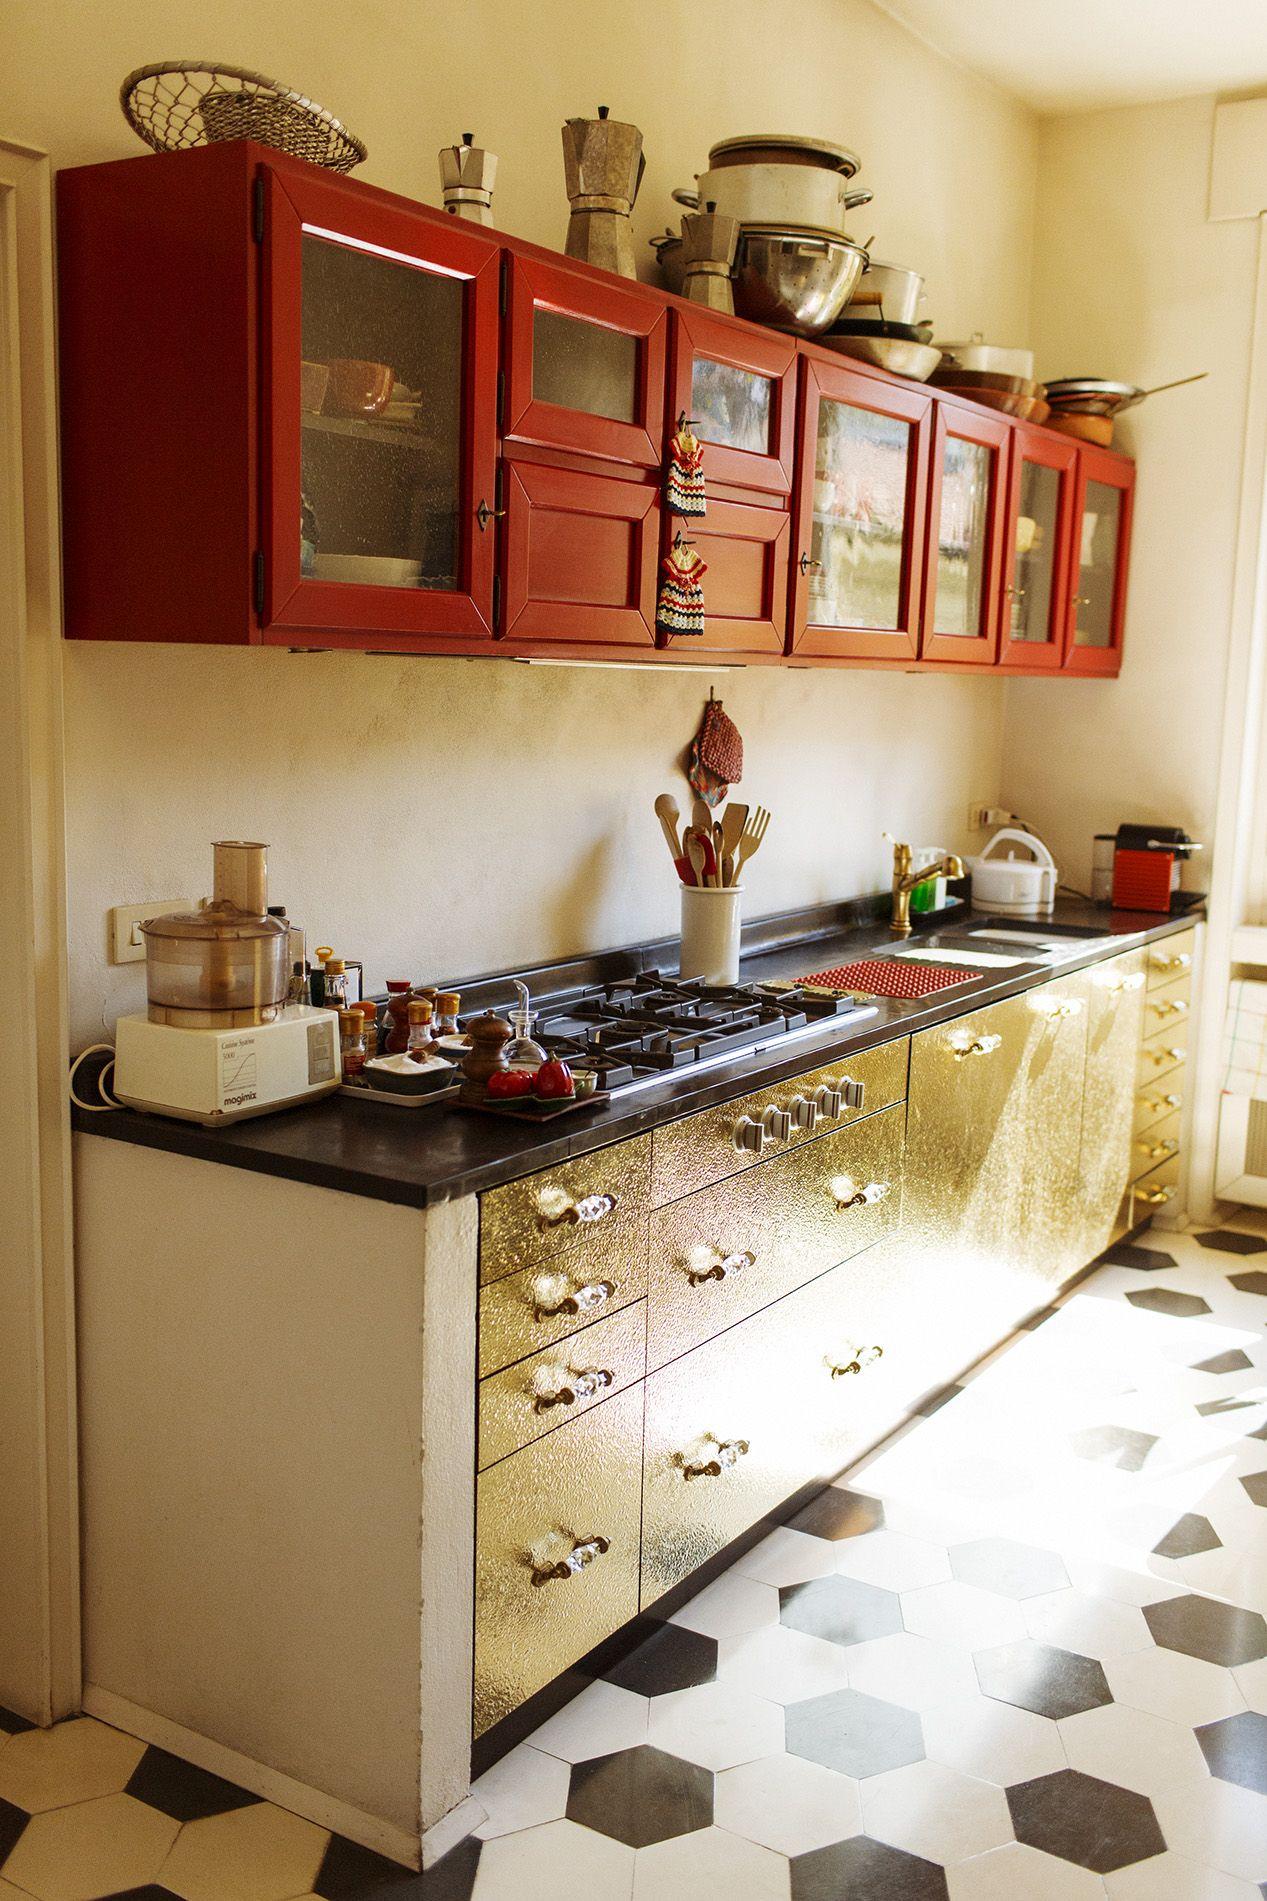 Commercial Kitchen Design Consultant Jobs Kitchen Design Consultant ...